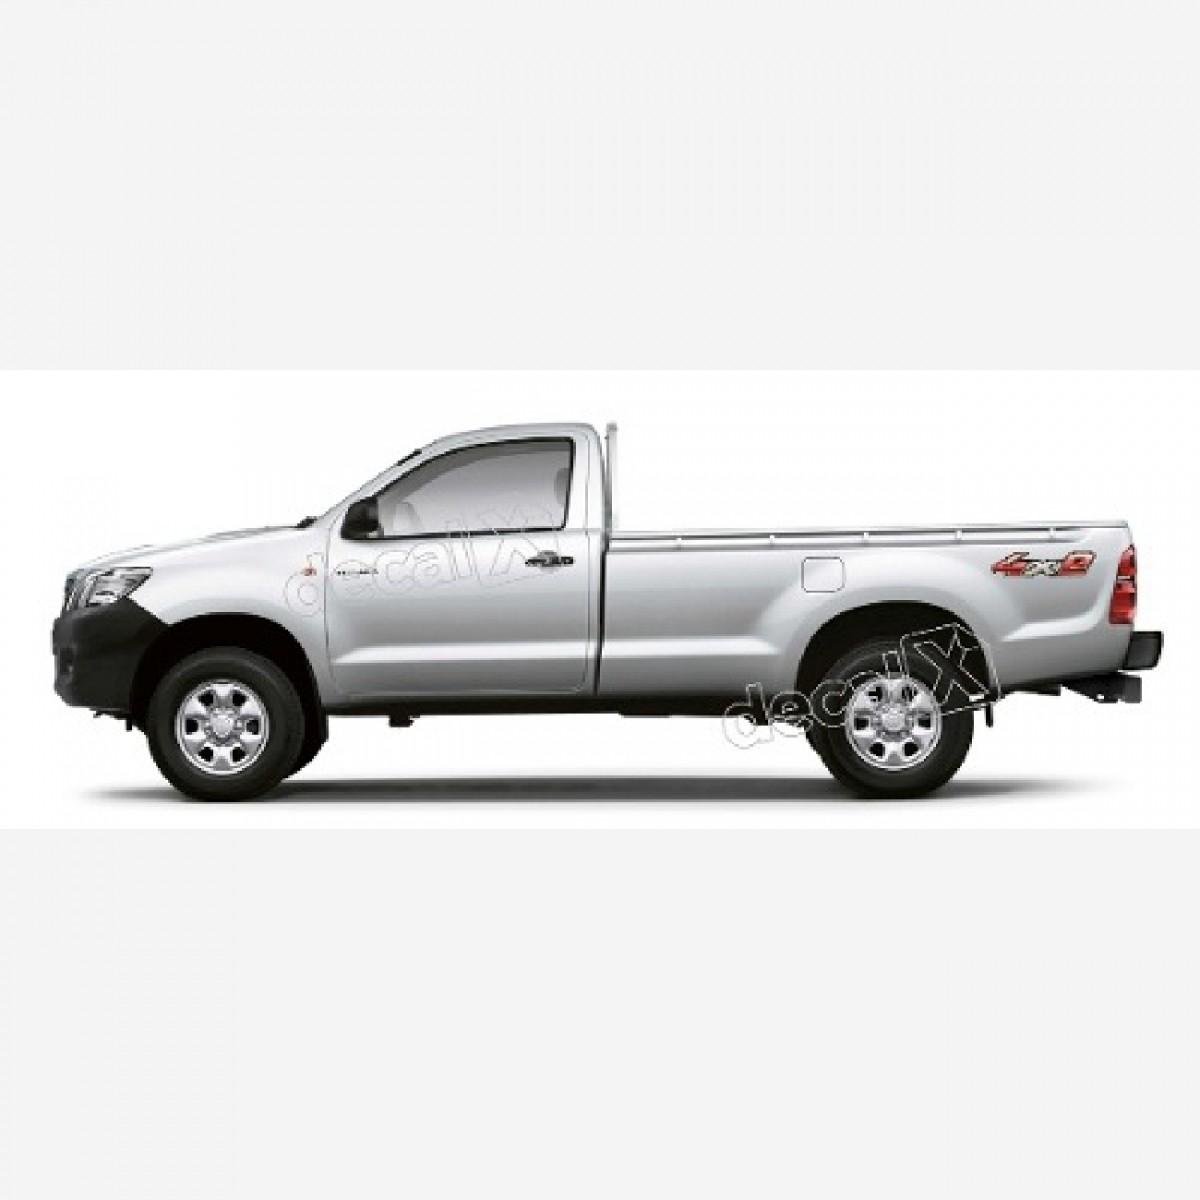 Adesivo Toyota Hilux 4x2 2009 A 2012 Decalx